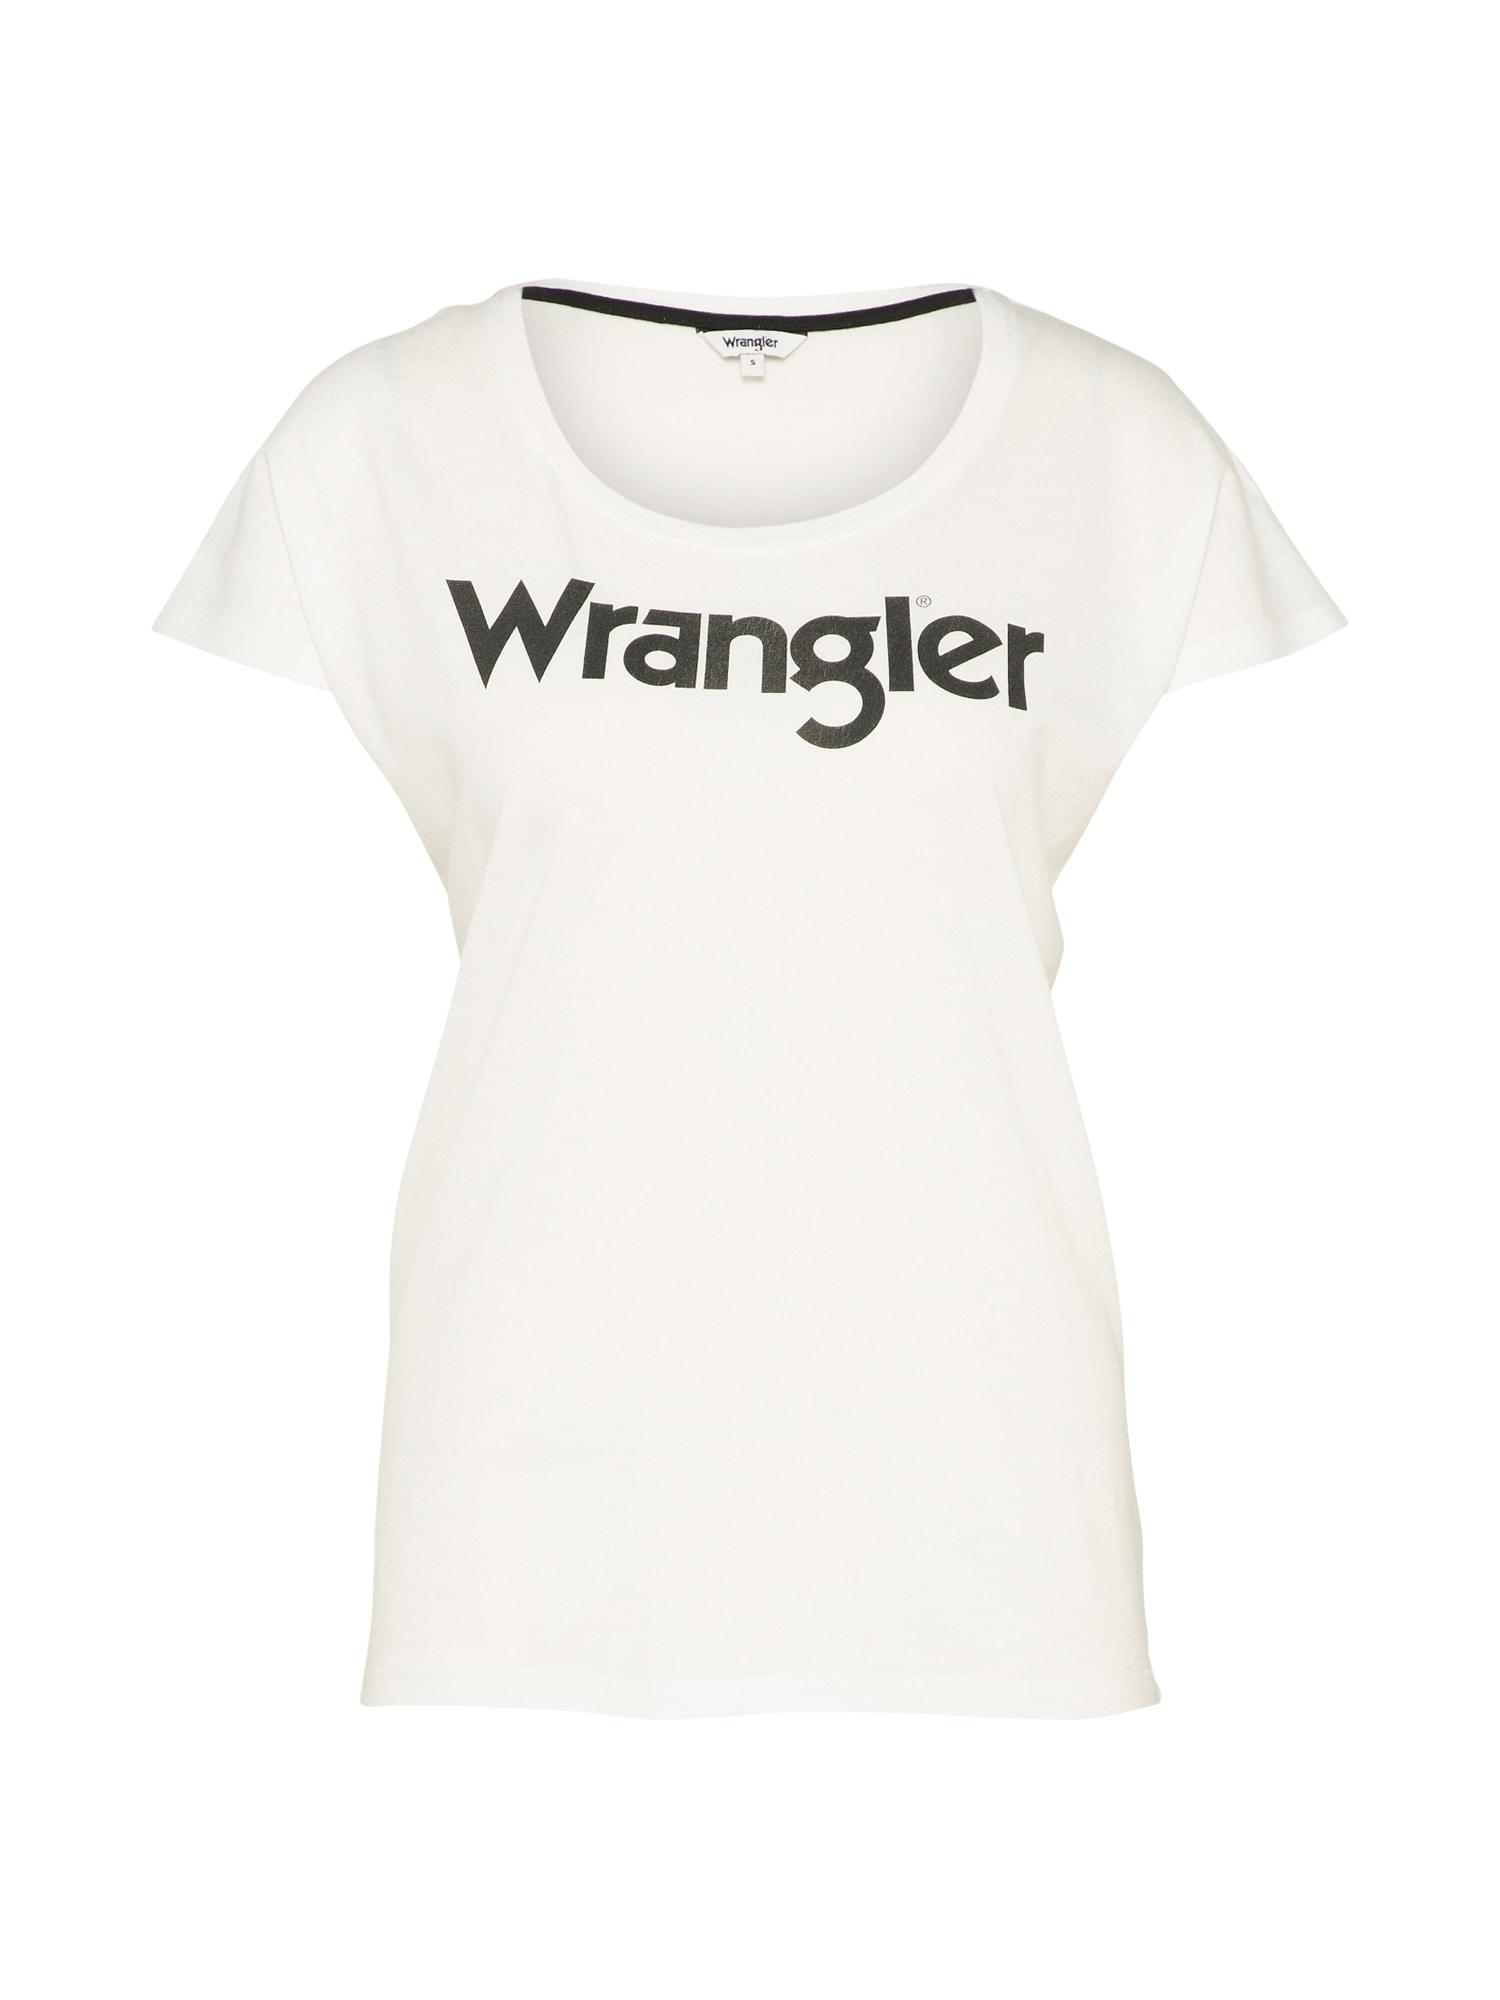 WRANGLER Dames Shirt LOGO zwart wit